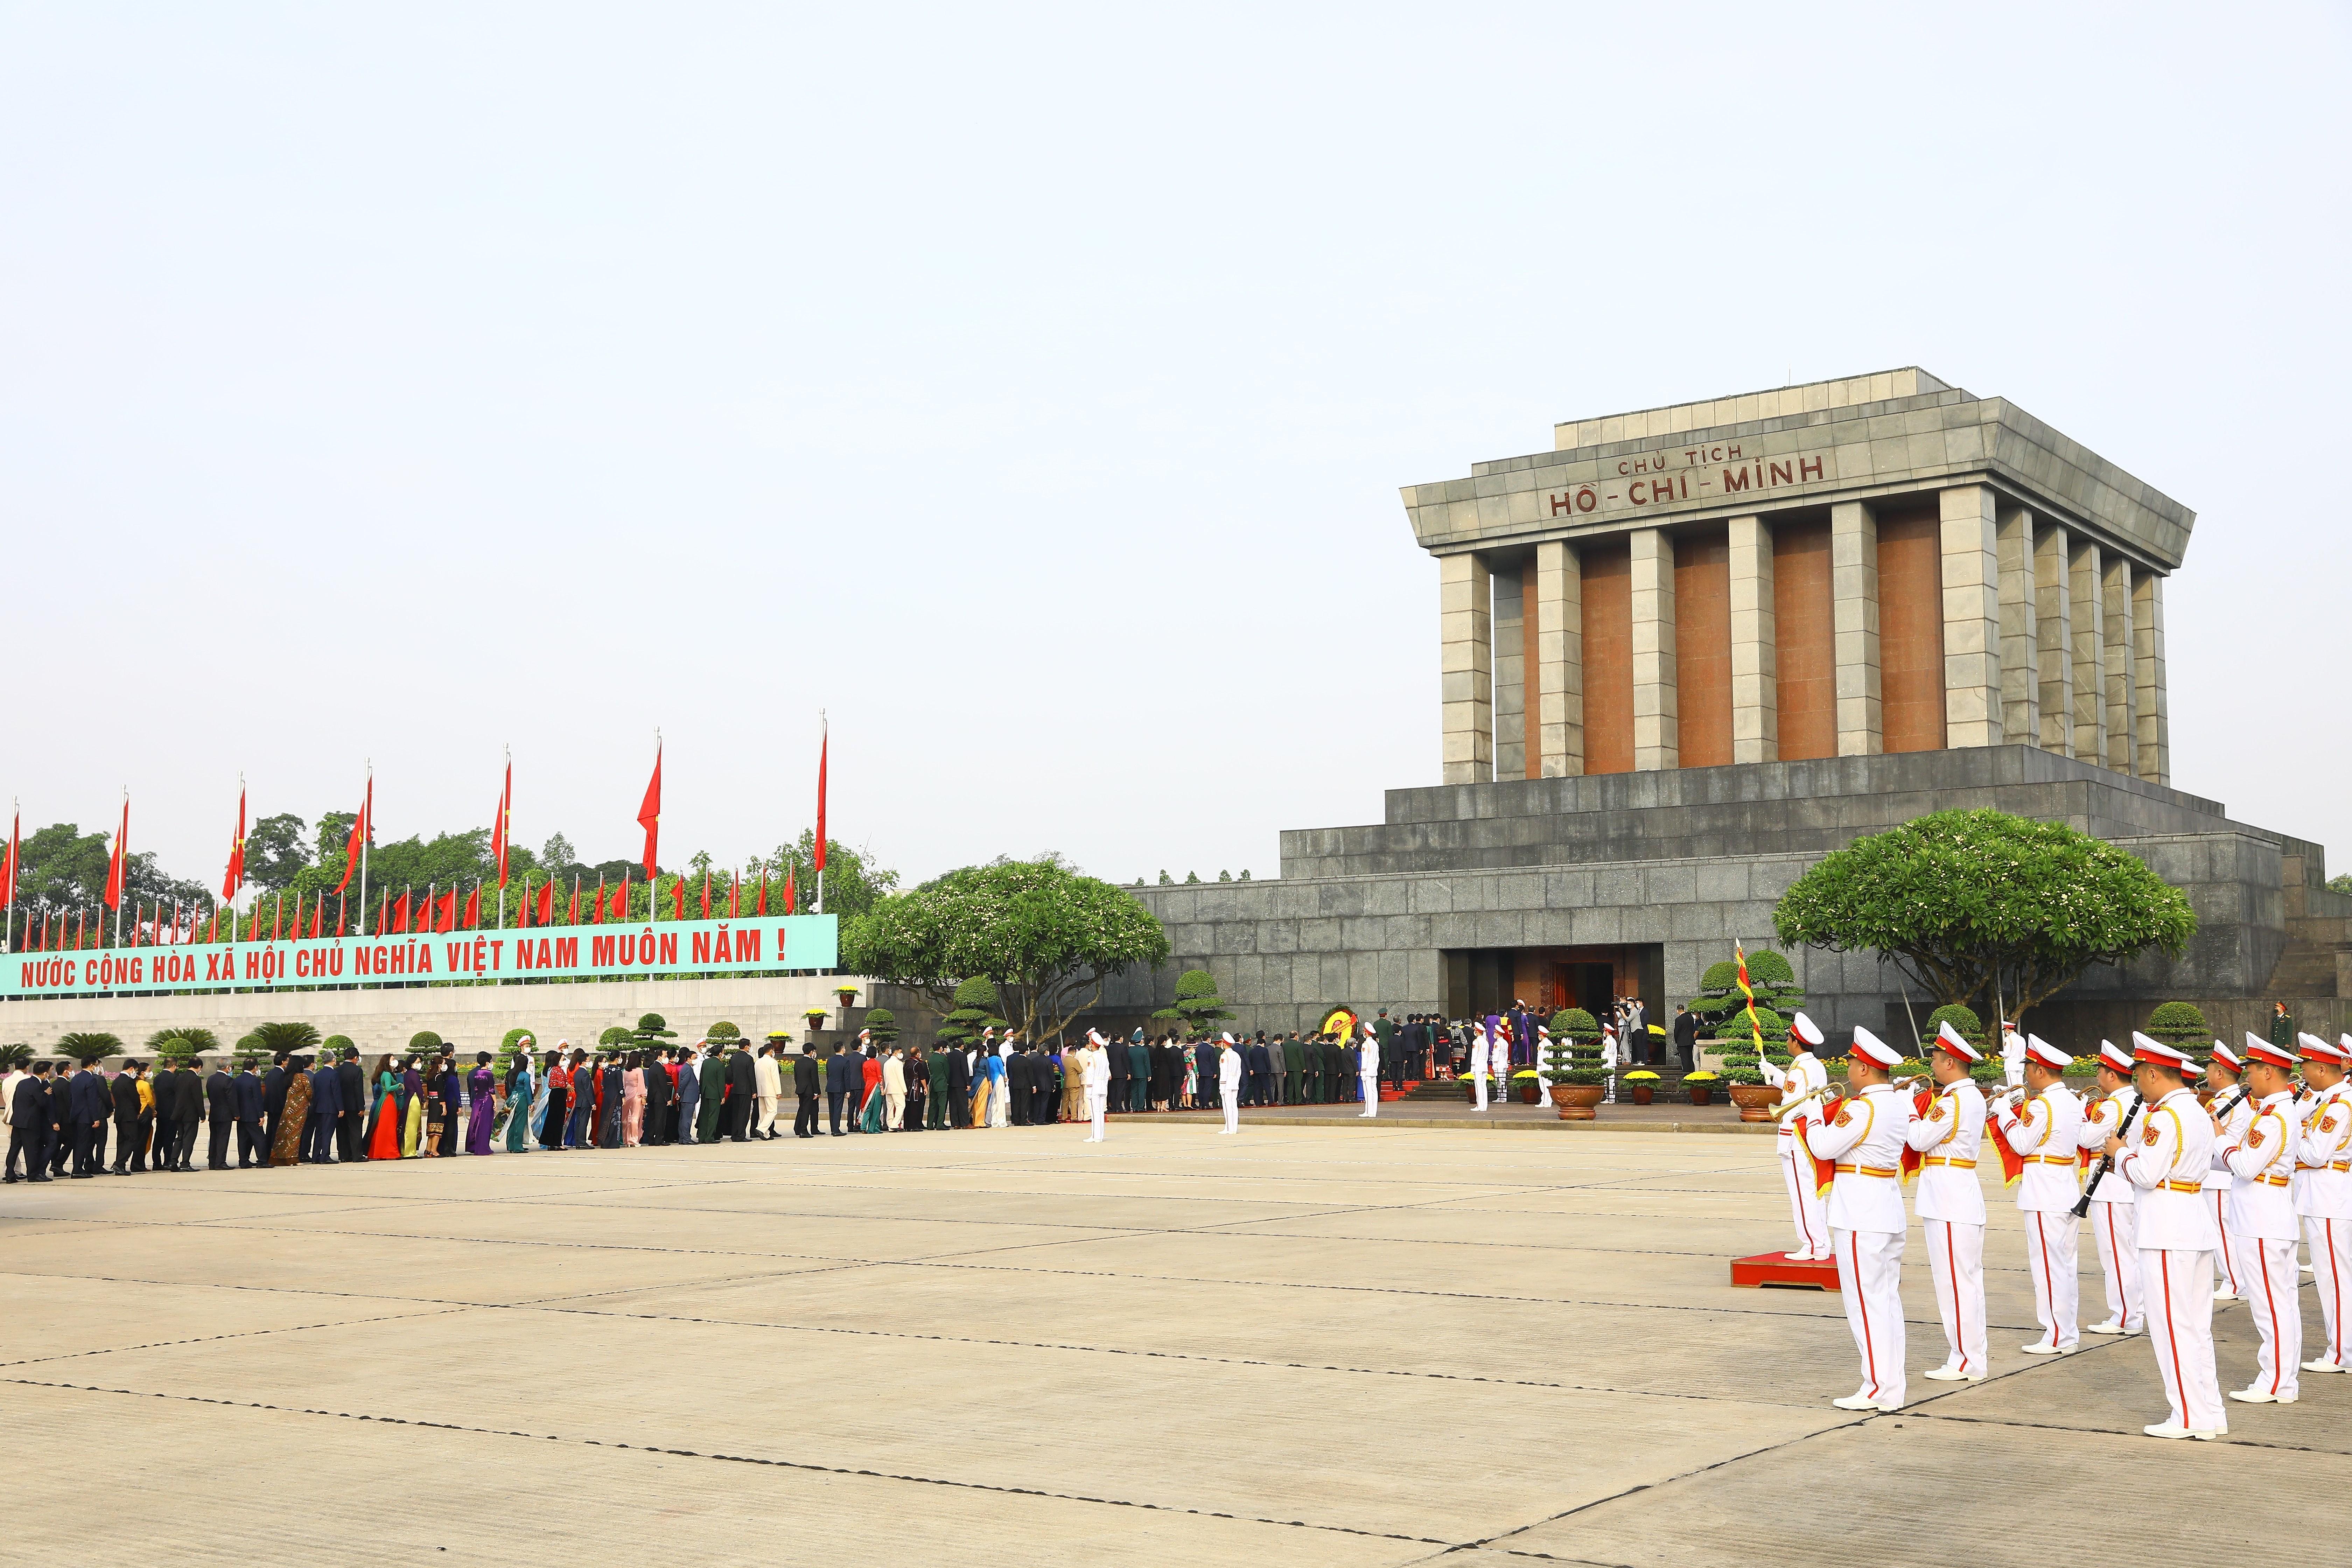 [Photo] Dai bieu Quoc hoi khoa XV vao Lang vieng Chu tich Ho Chi Minh hinh anh 8